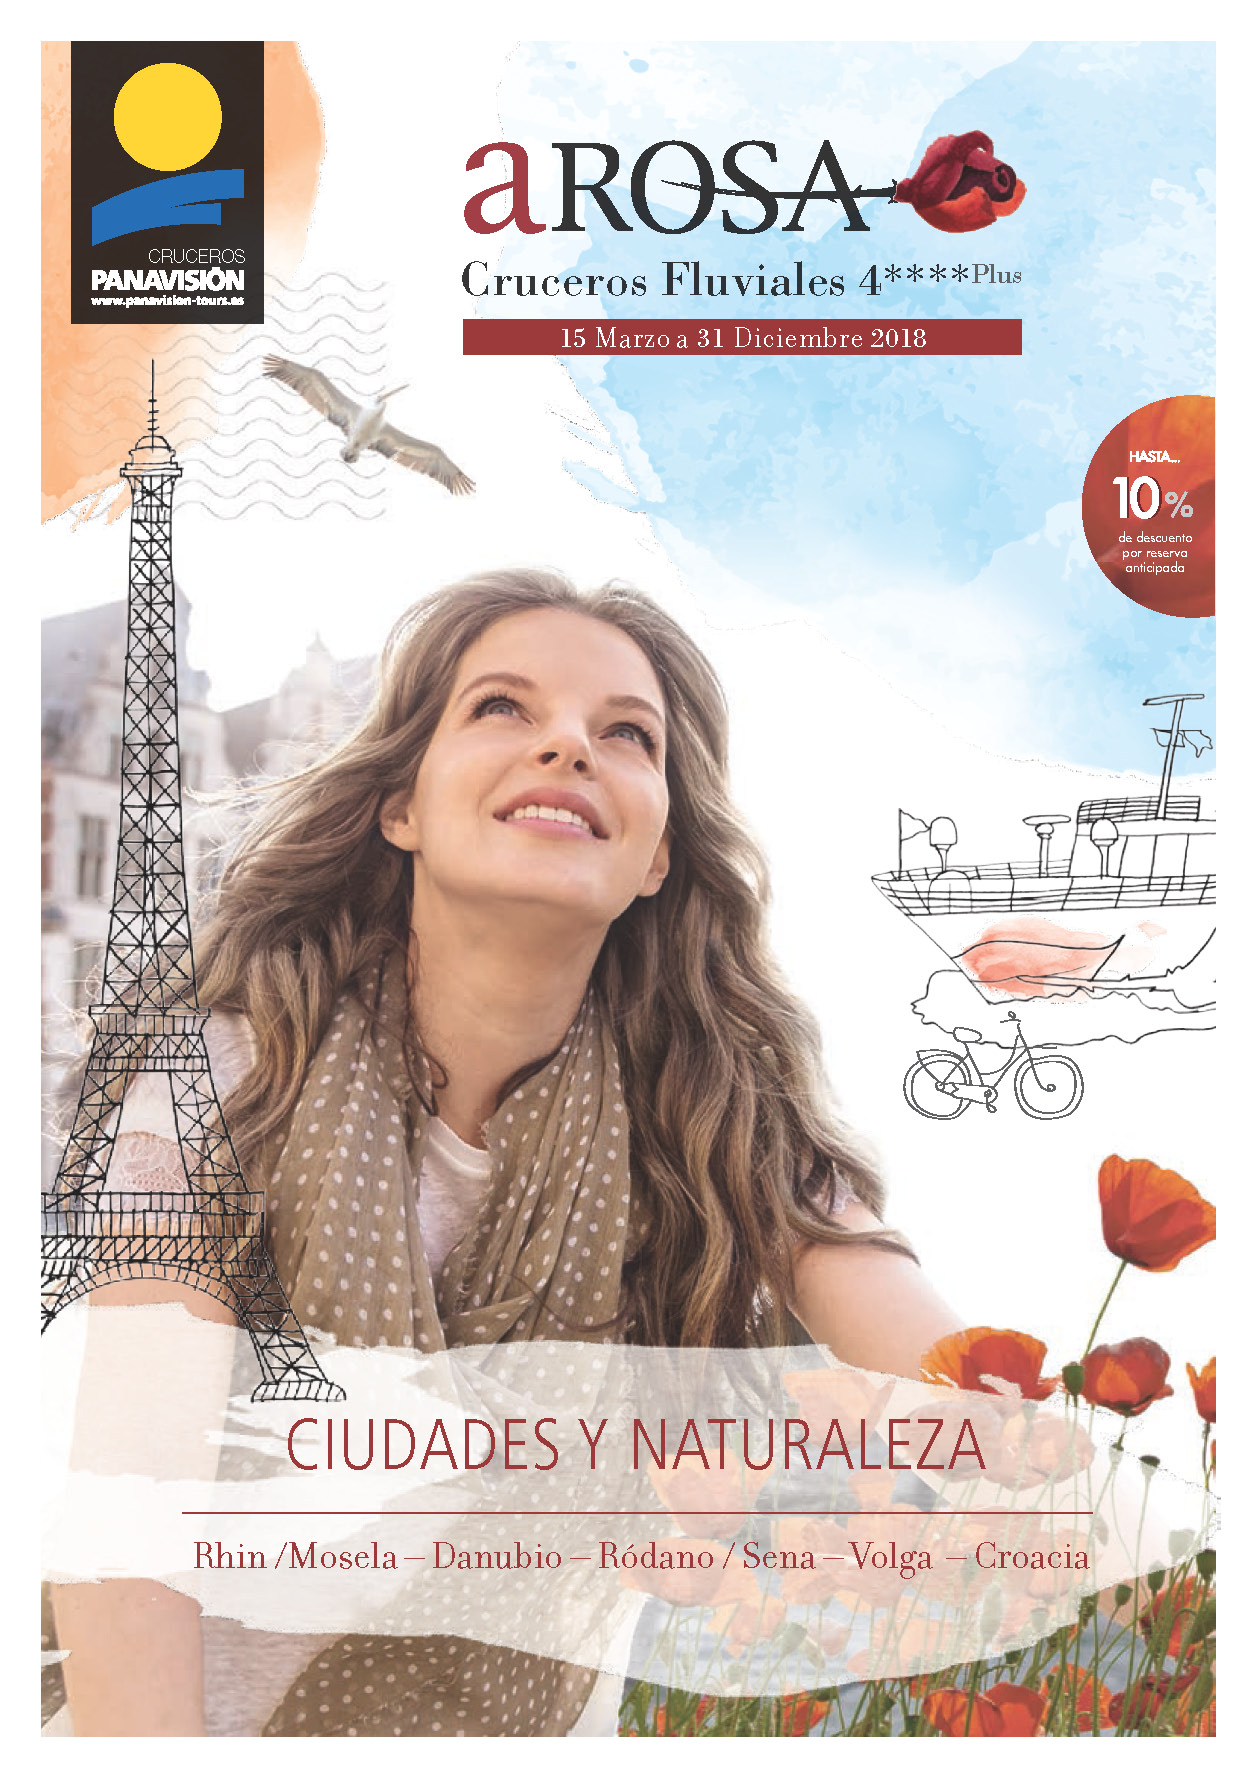 Catalogo Panavision Tours Cruceros Fluviales 2018